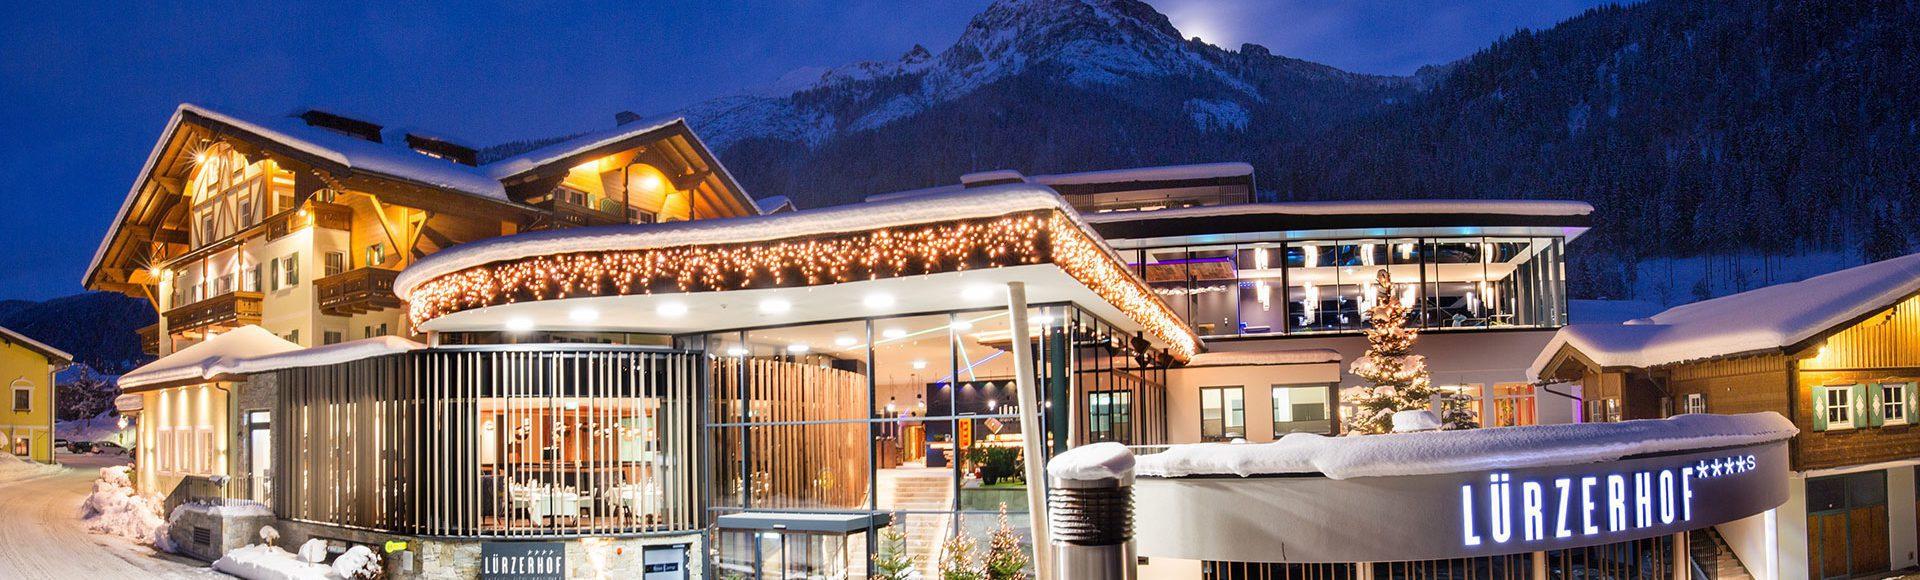 Winterurlaub & Skiurlaub - Hotel Lürzerhof